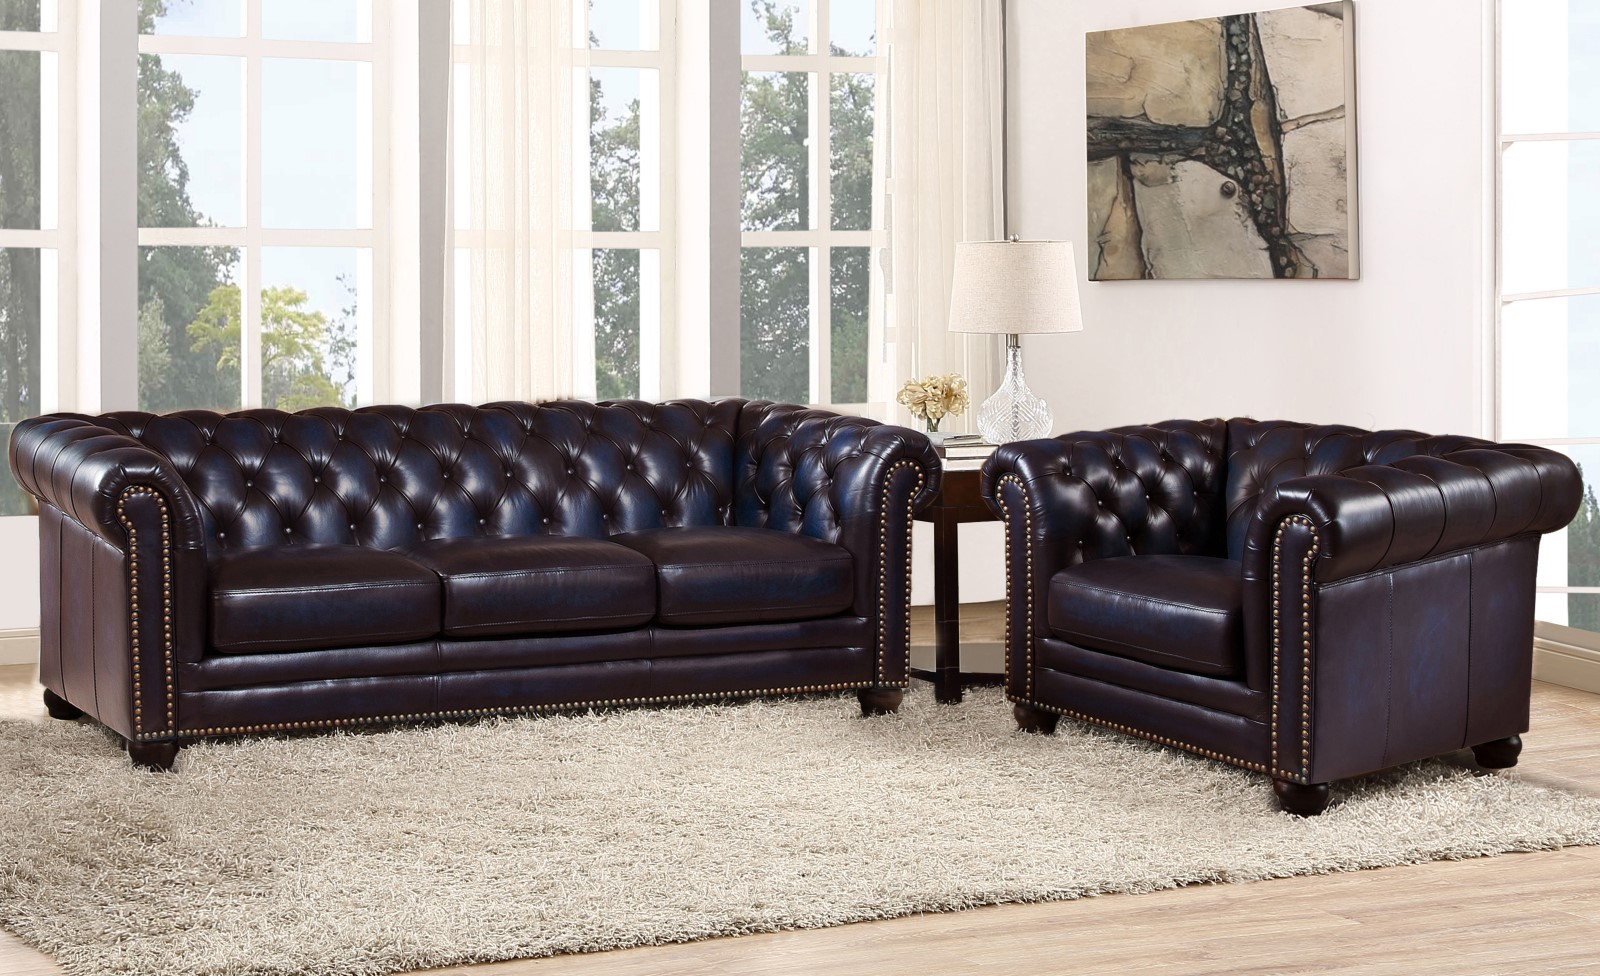 Dynasty 100% Genuine Leather Chesterfield Sofa & Armchair Regarding Leather Chesterfield Sofas (View 3 of 15)